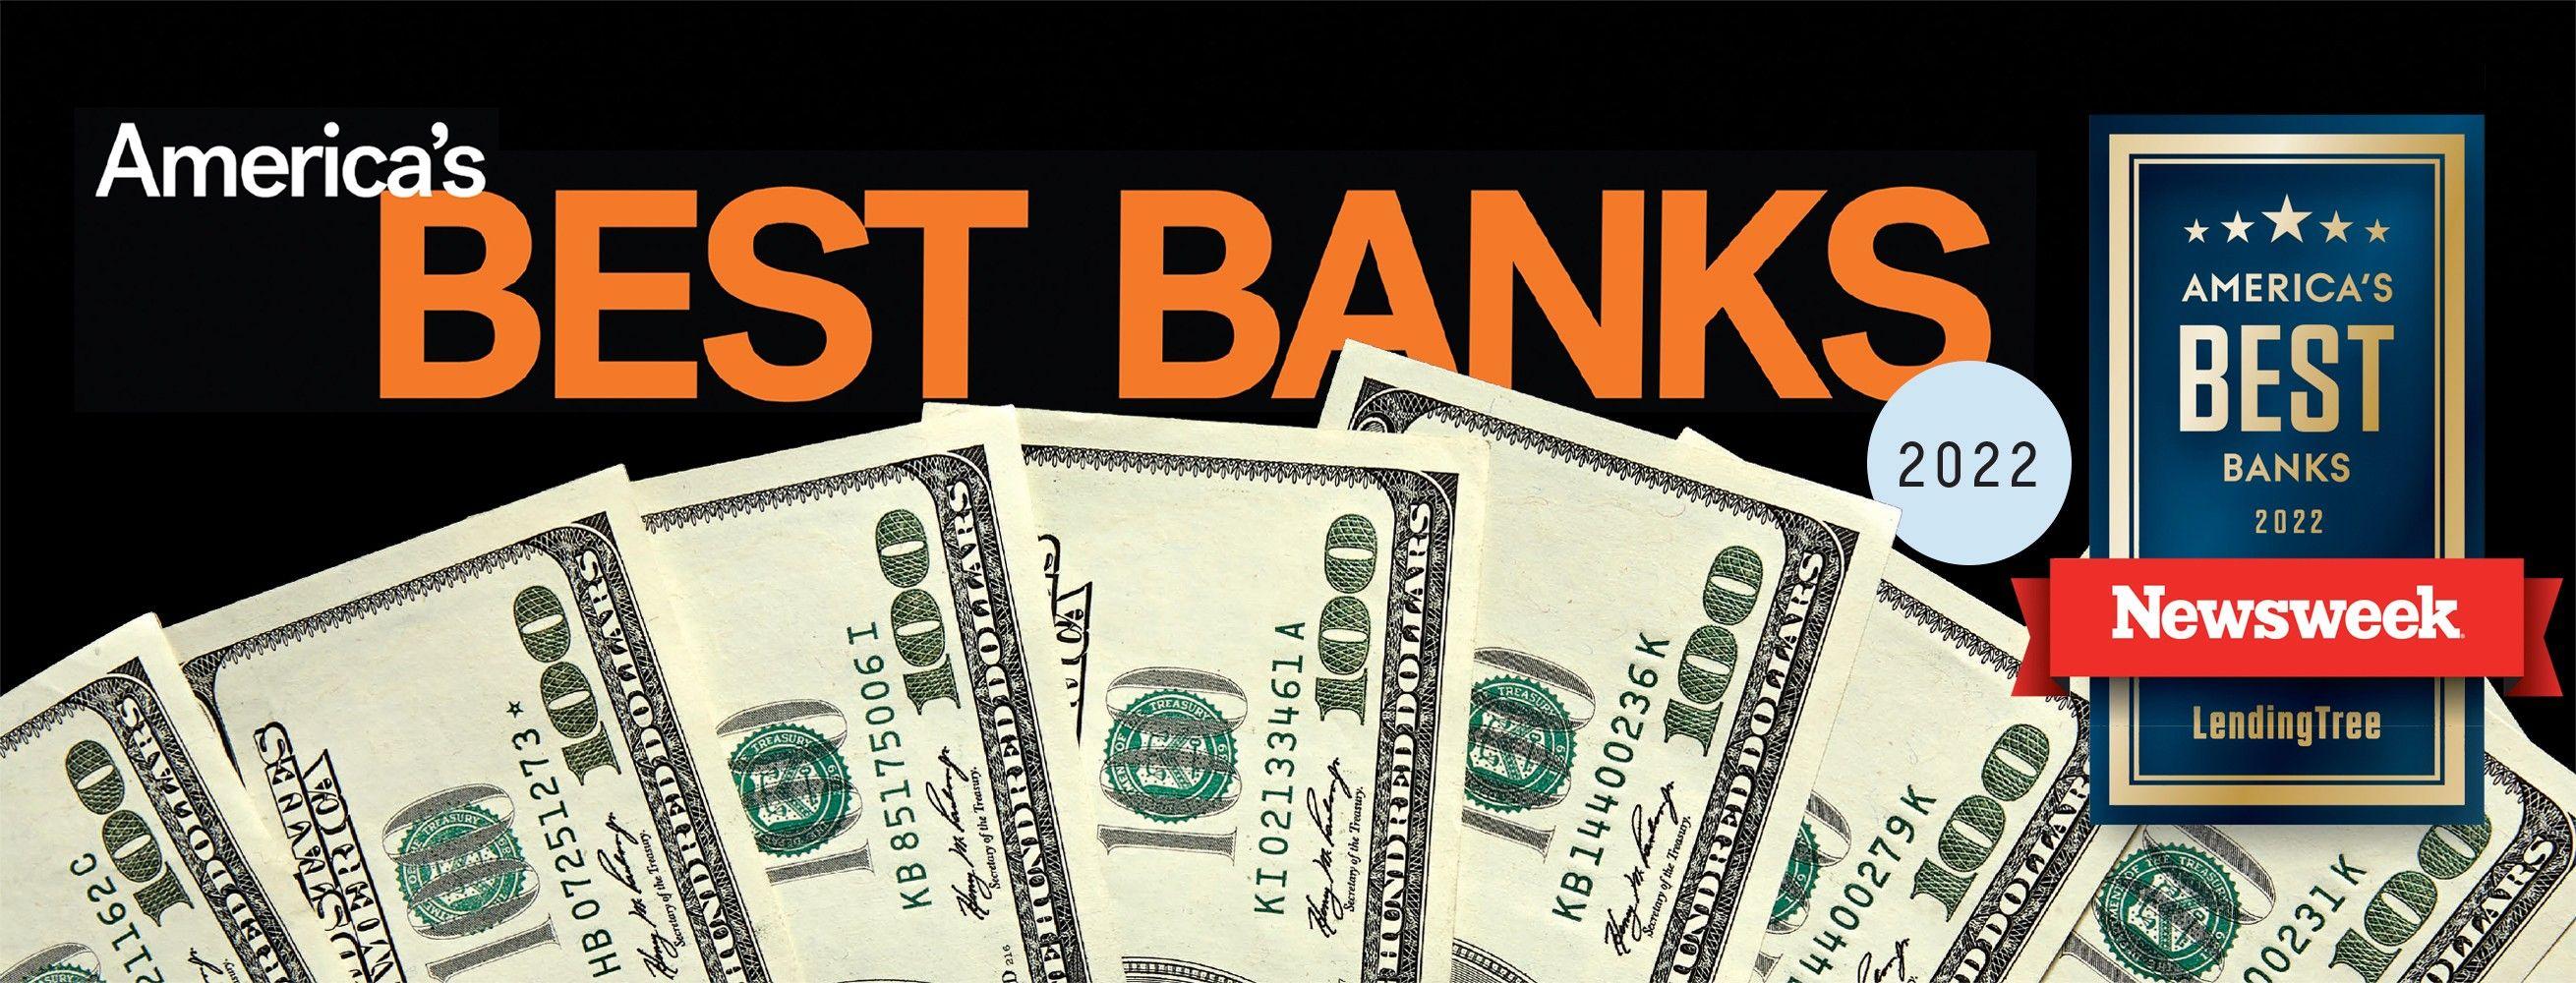 America's Best Banks 2022